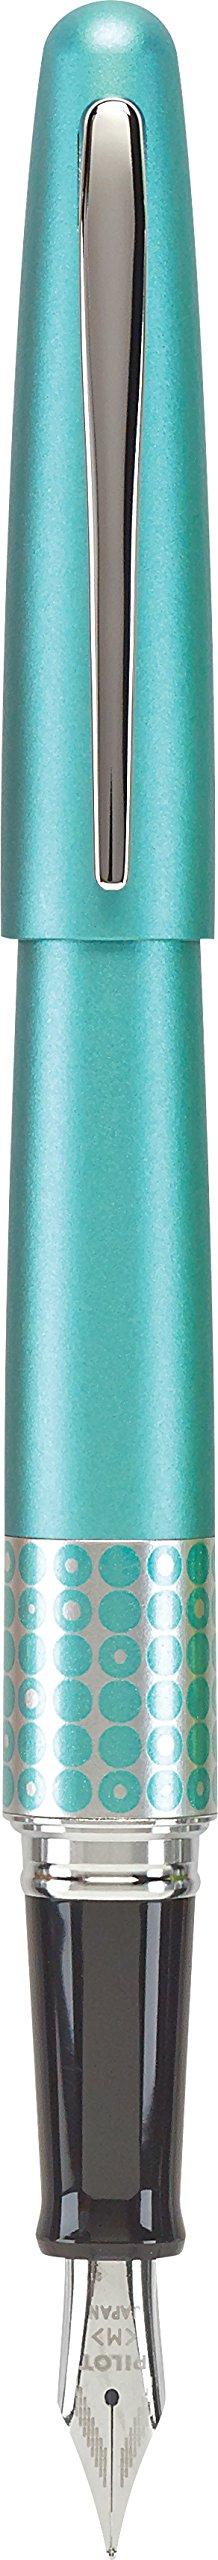 Pilot MR Retro Pop Collection Fountain Pen, Turquoise Barrel with Dots Accent, Fine Nib, Black Ink (91436) by Pilot (Image #1)